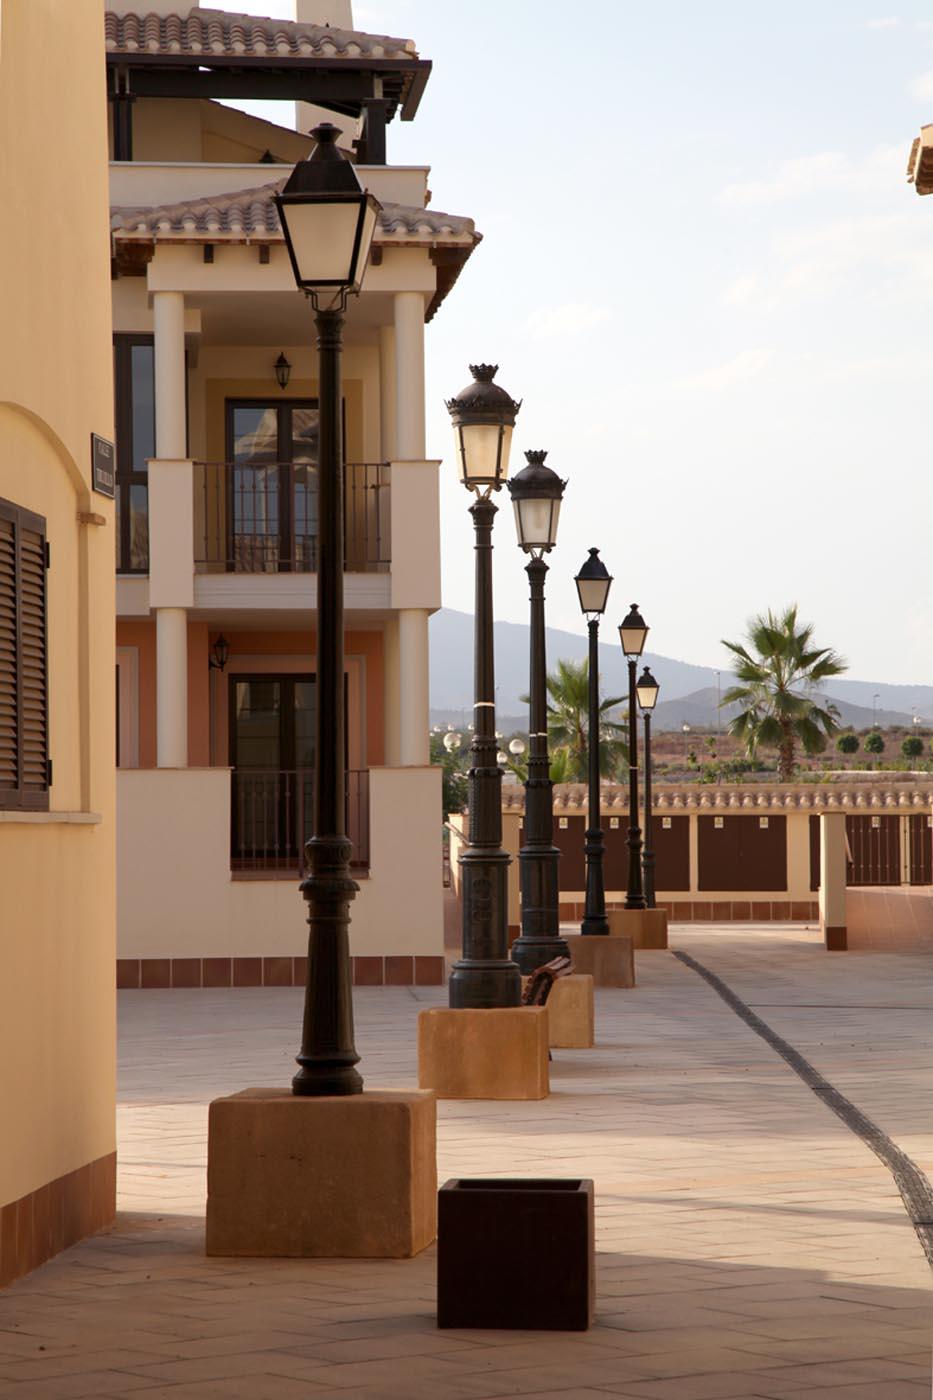 3 Bedroom Apartment in Pueblo Espanol